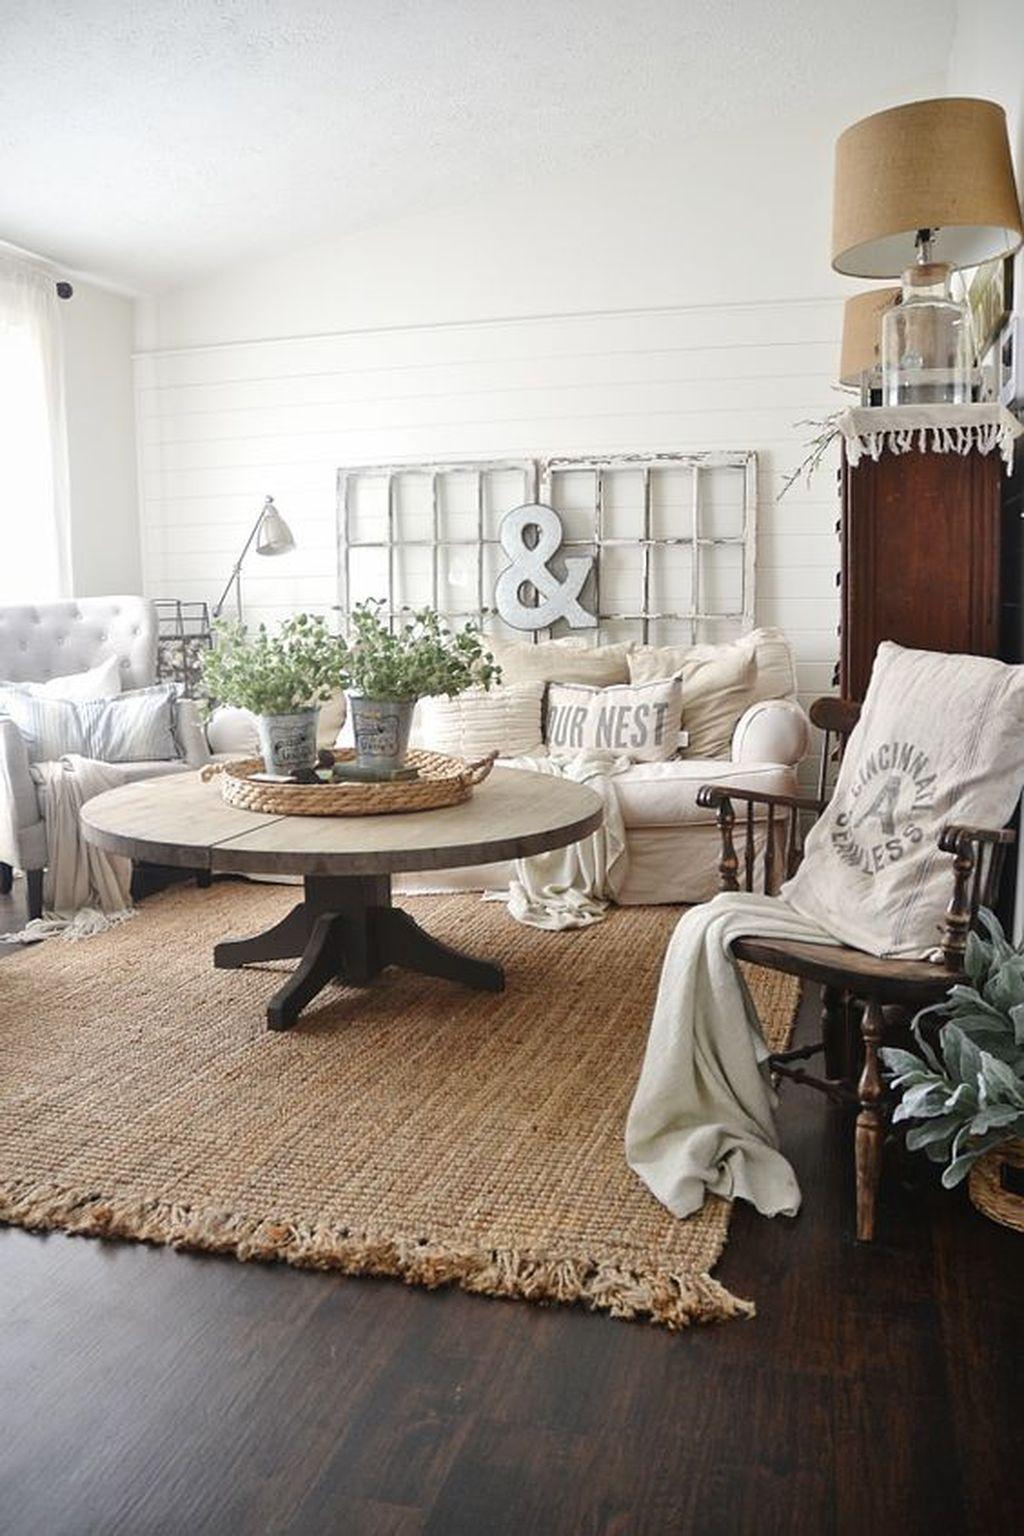 Cool 36 Amazing Modern Farmhouse Living Room Decor Ideas